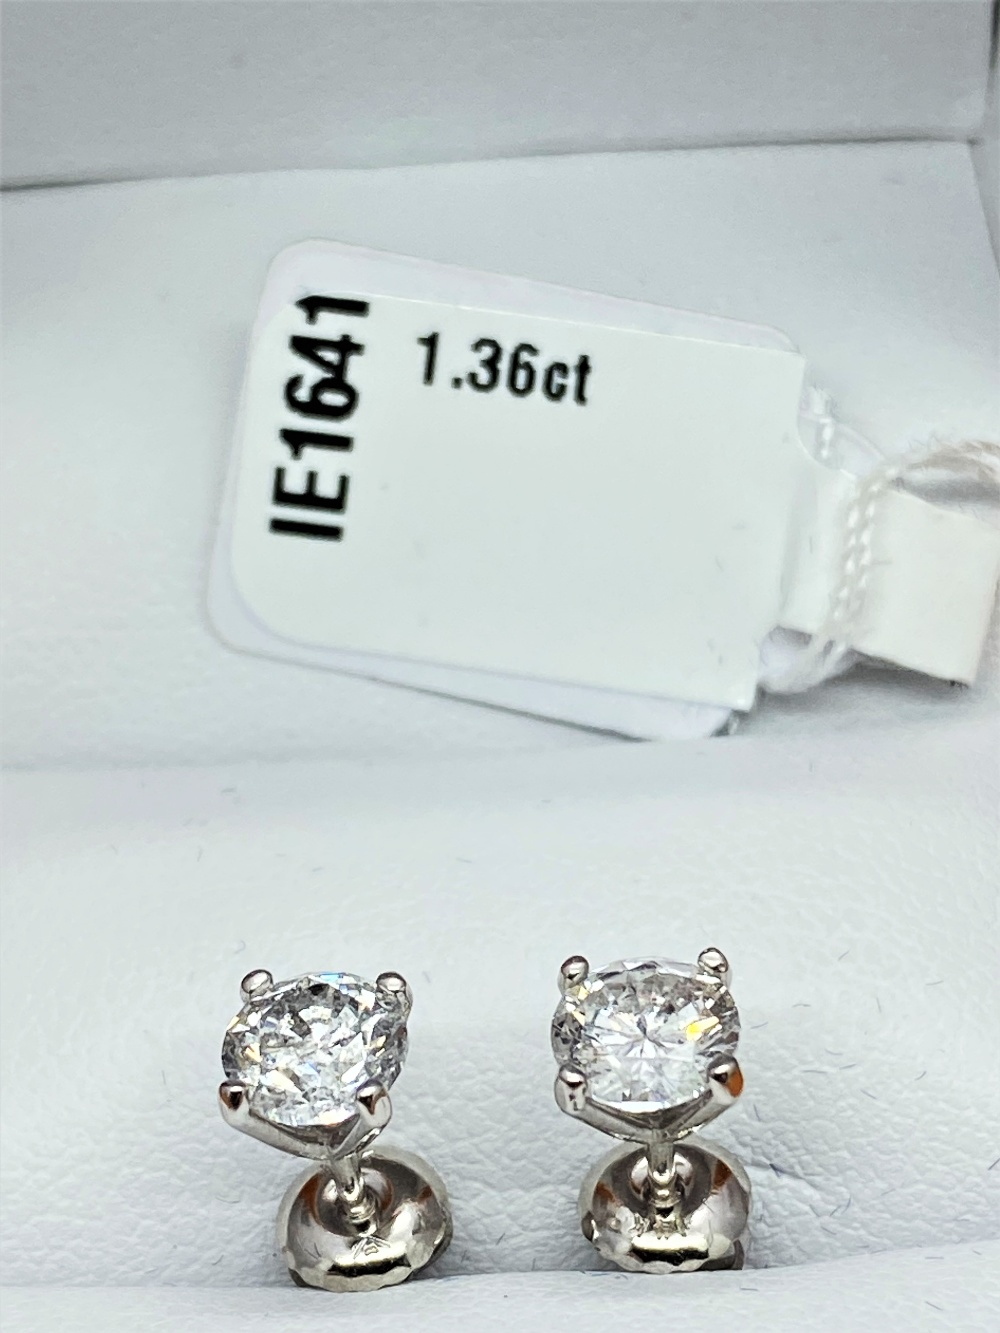 Pair of New 1.36 Carat Round Cut VS1/D Diamond Stud Earrings On 14K Hallmarked White Gold - Image 7 of 7